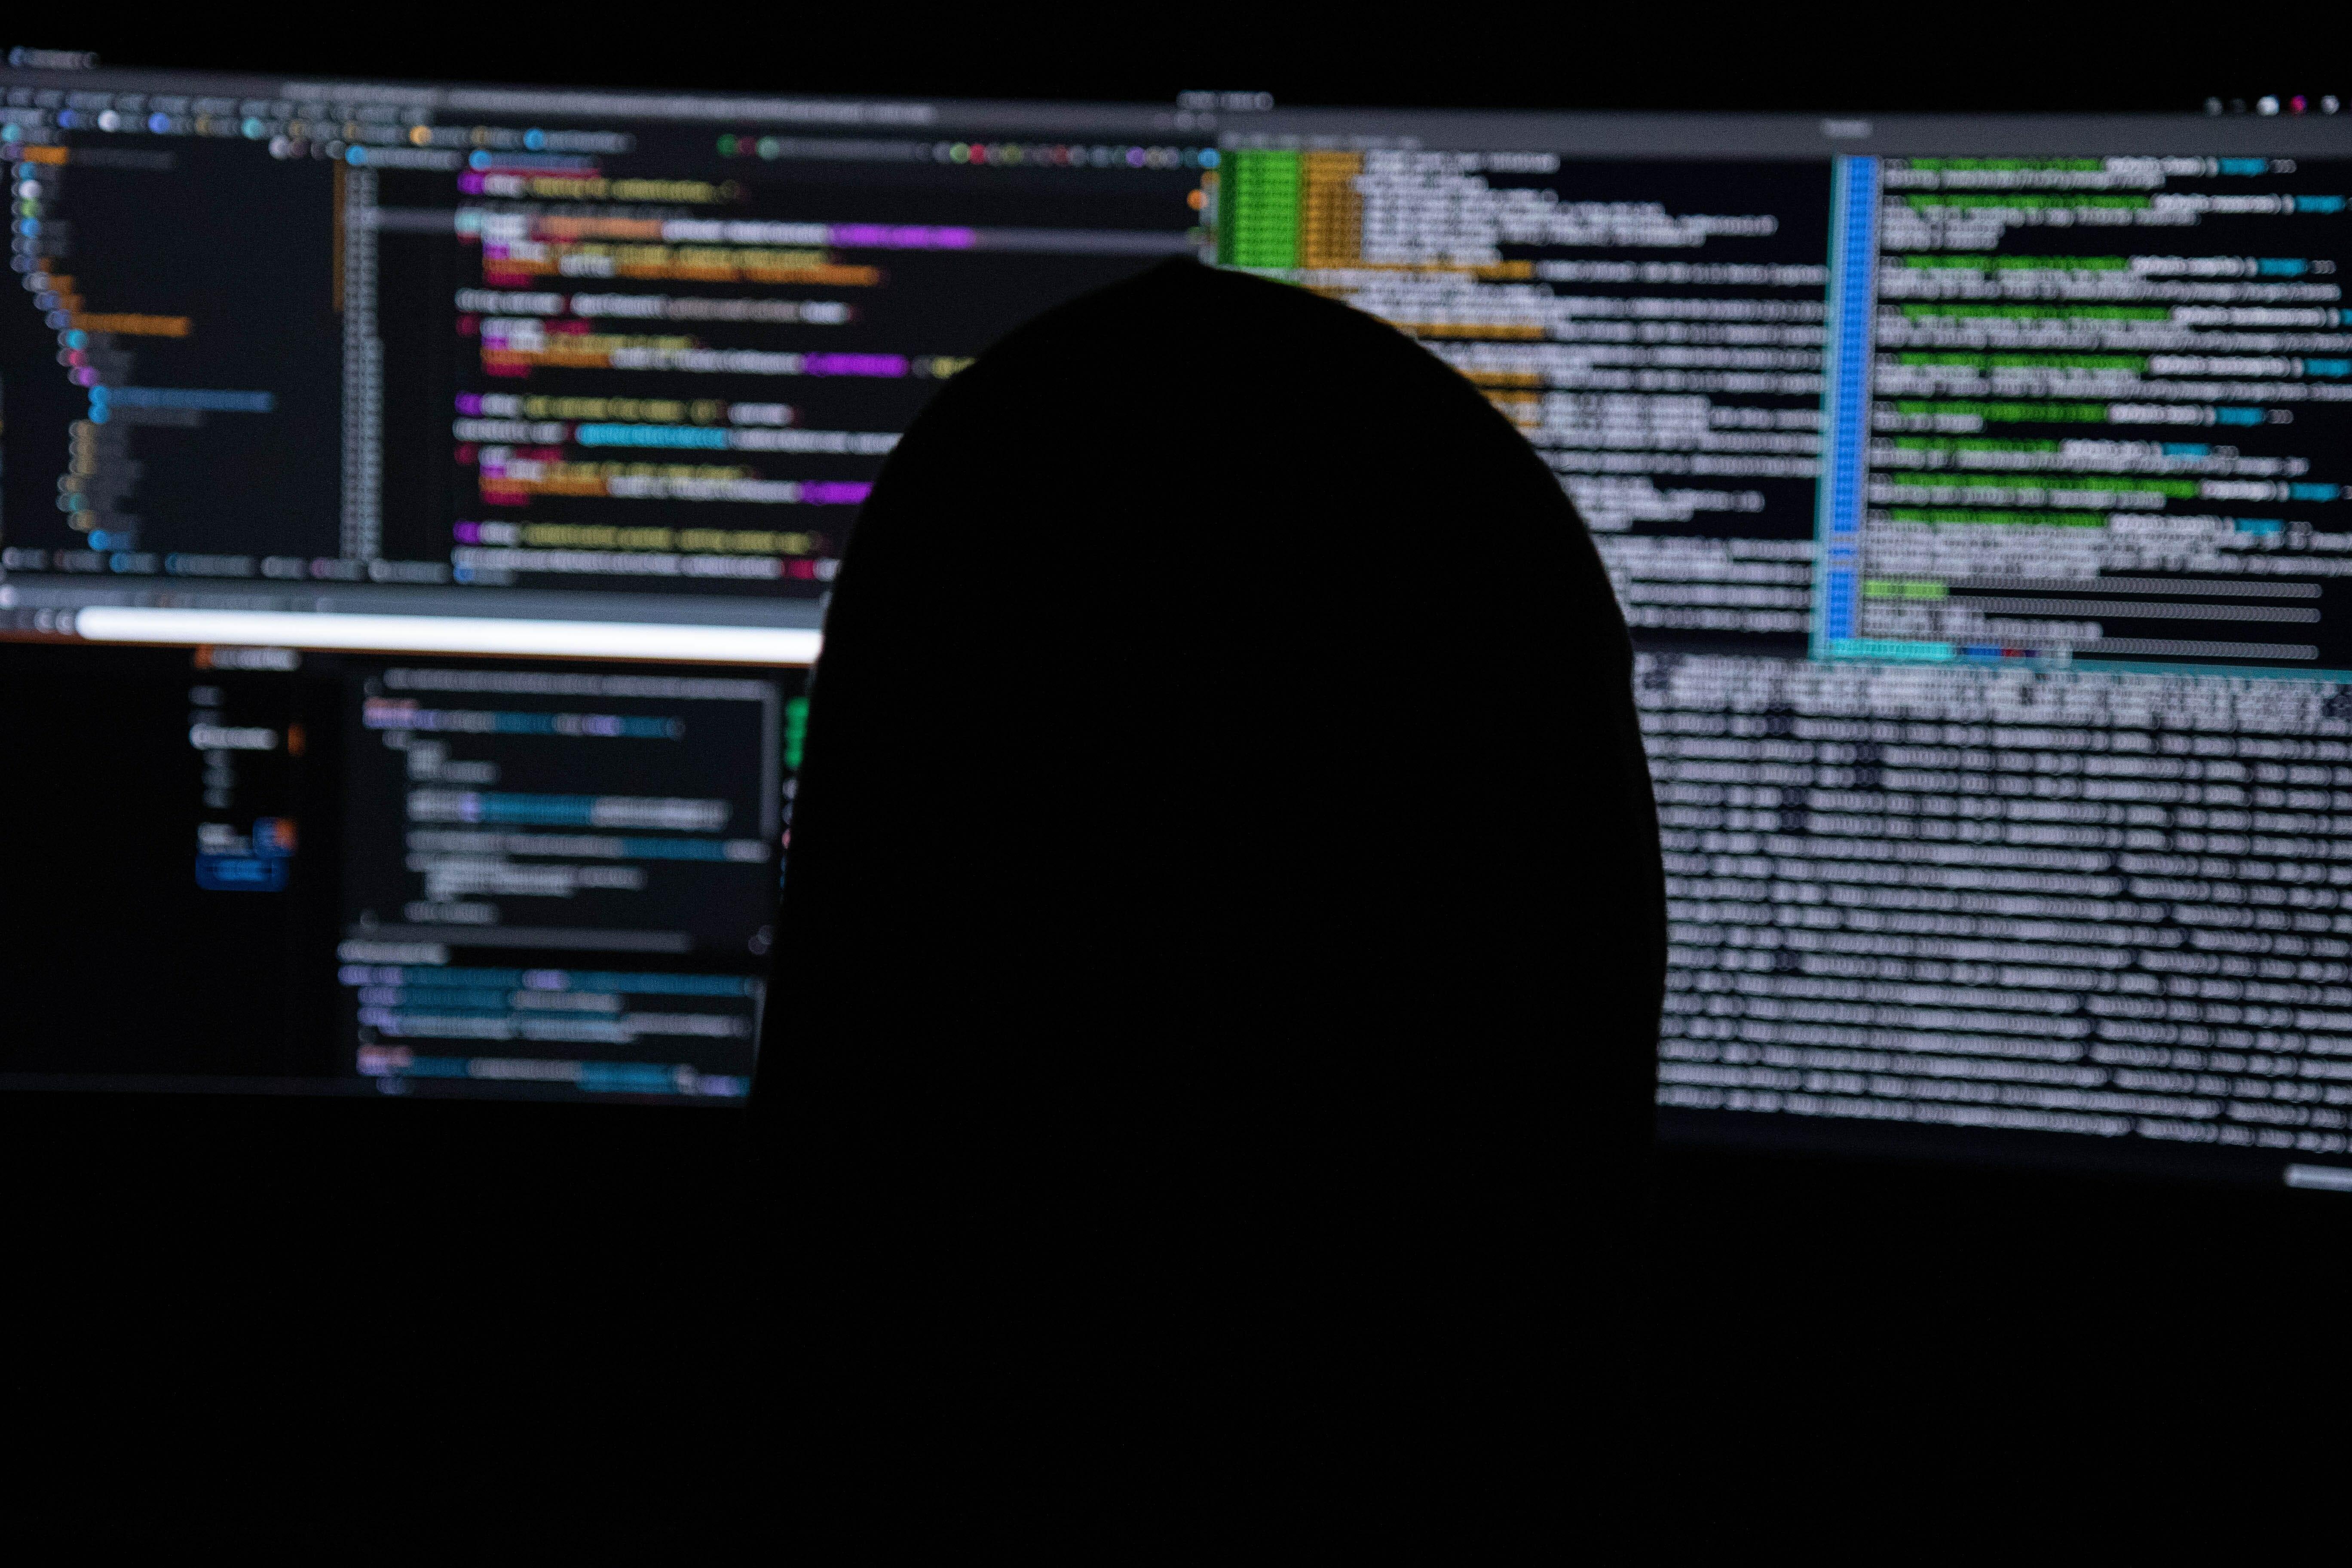 Load Testing Tutorial - Server Monitoring